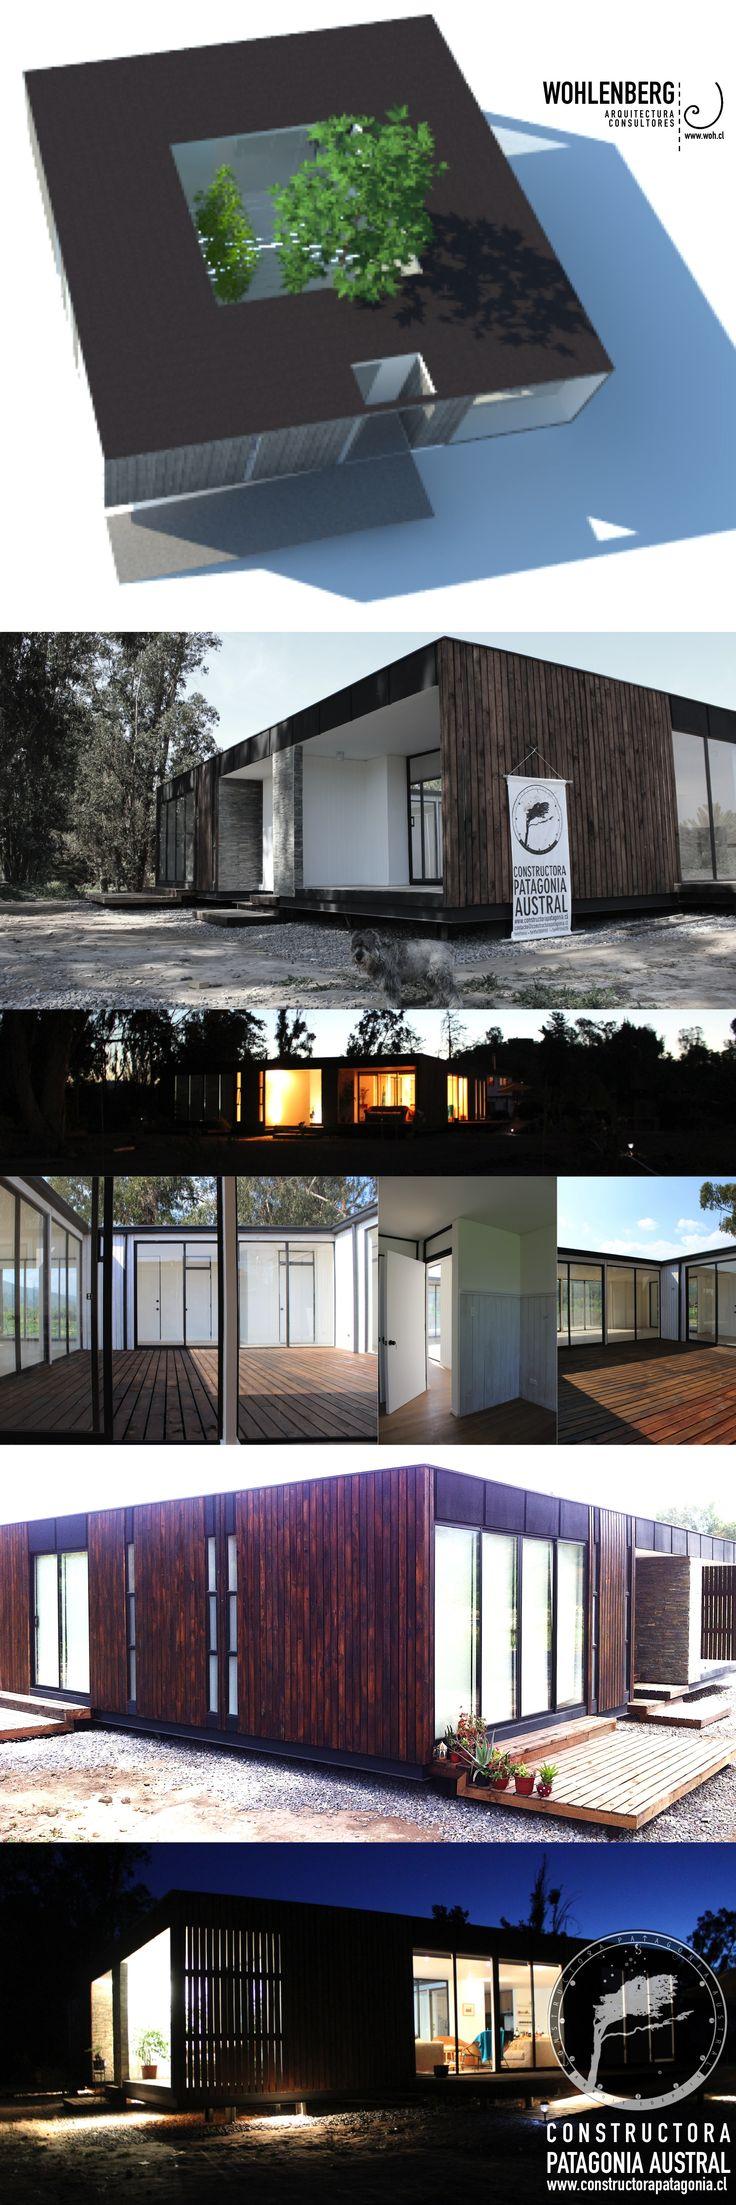 Casa Weisntein, Arquitecto Johann Wohlenberg, Constructora Patagonia Austral. Chilean house